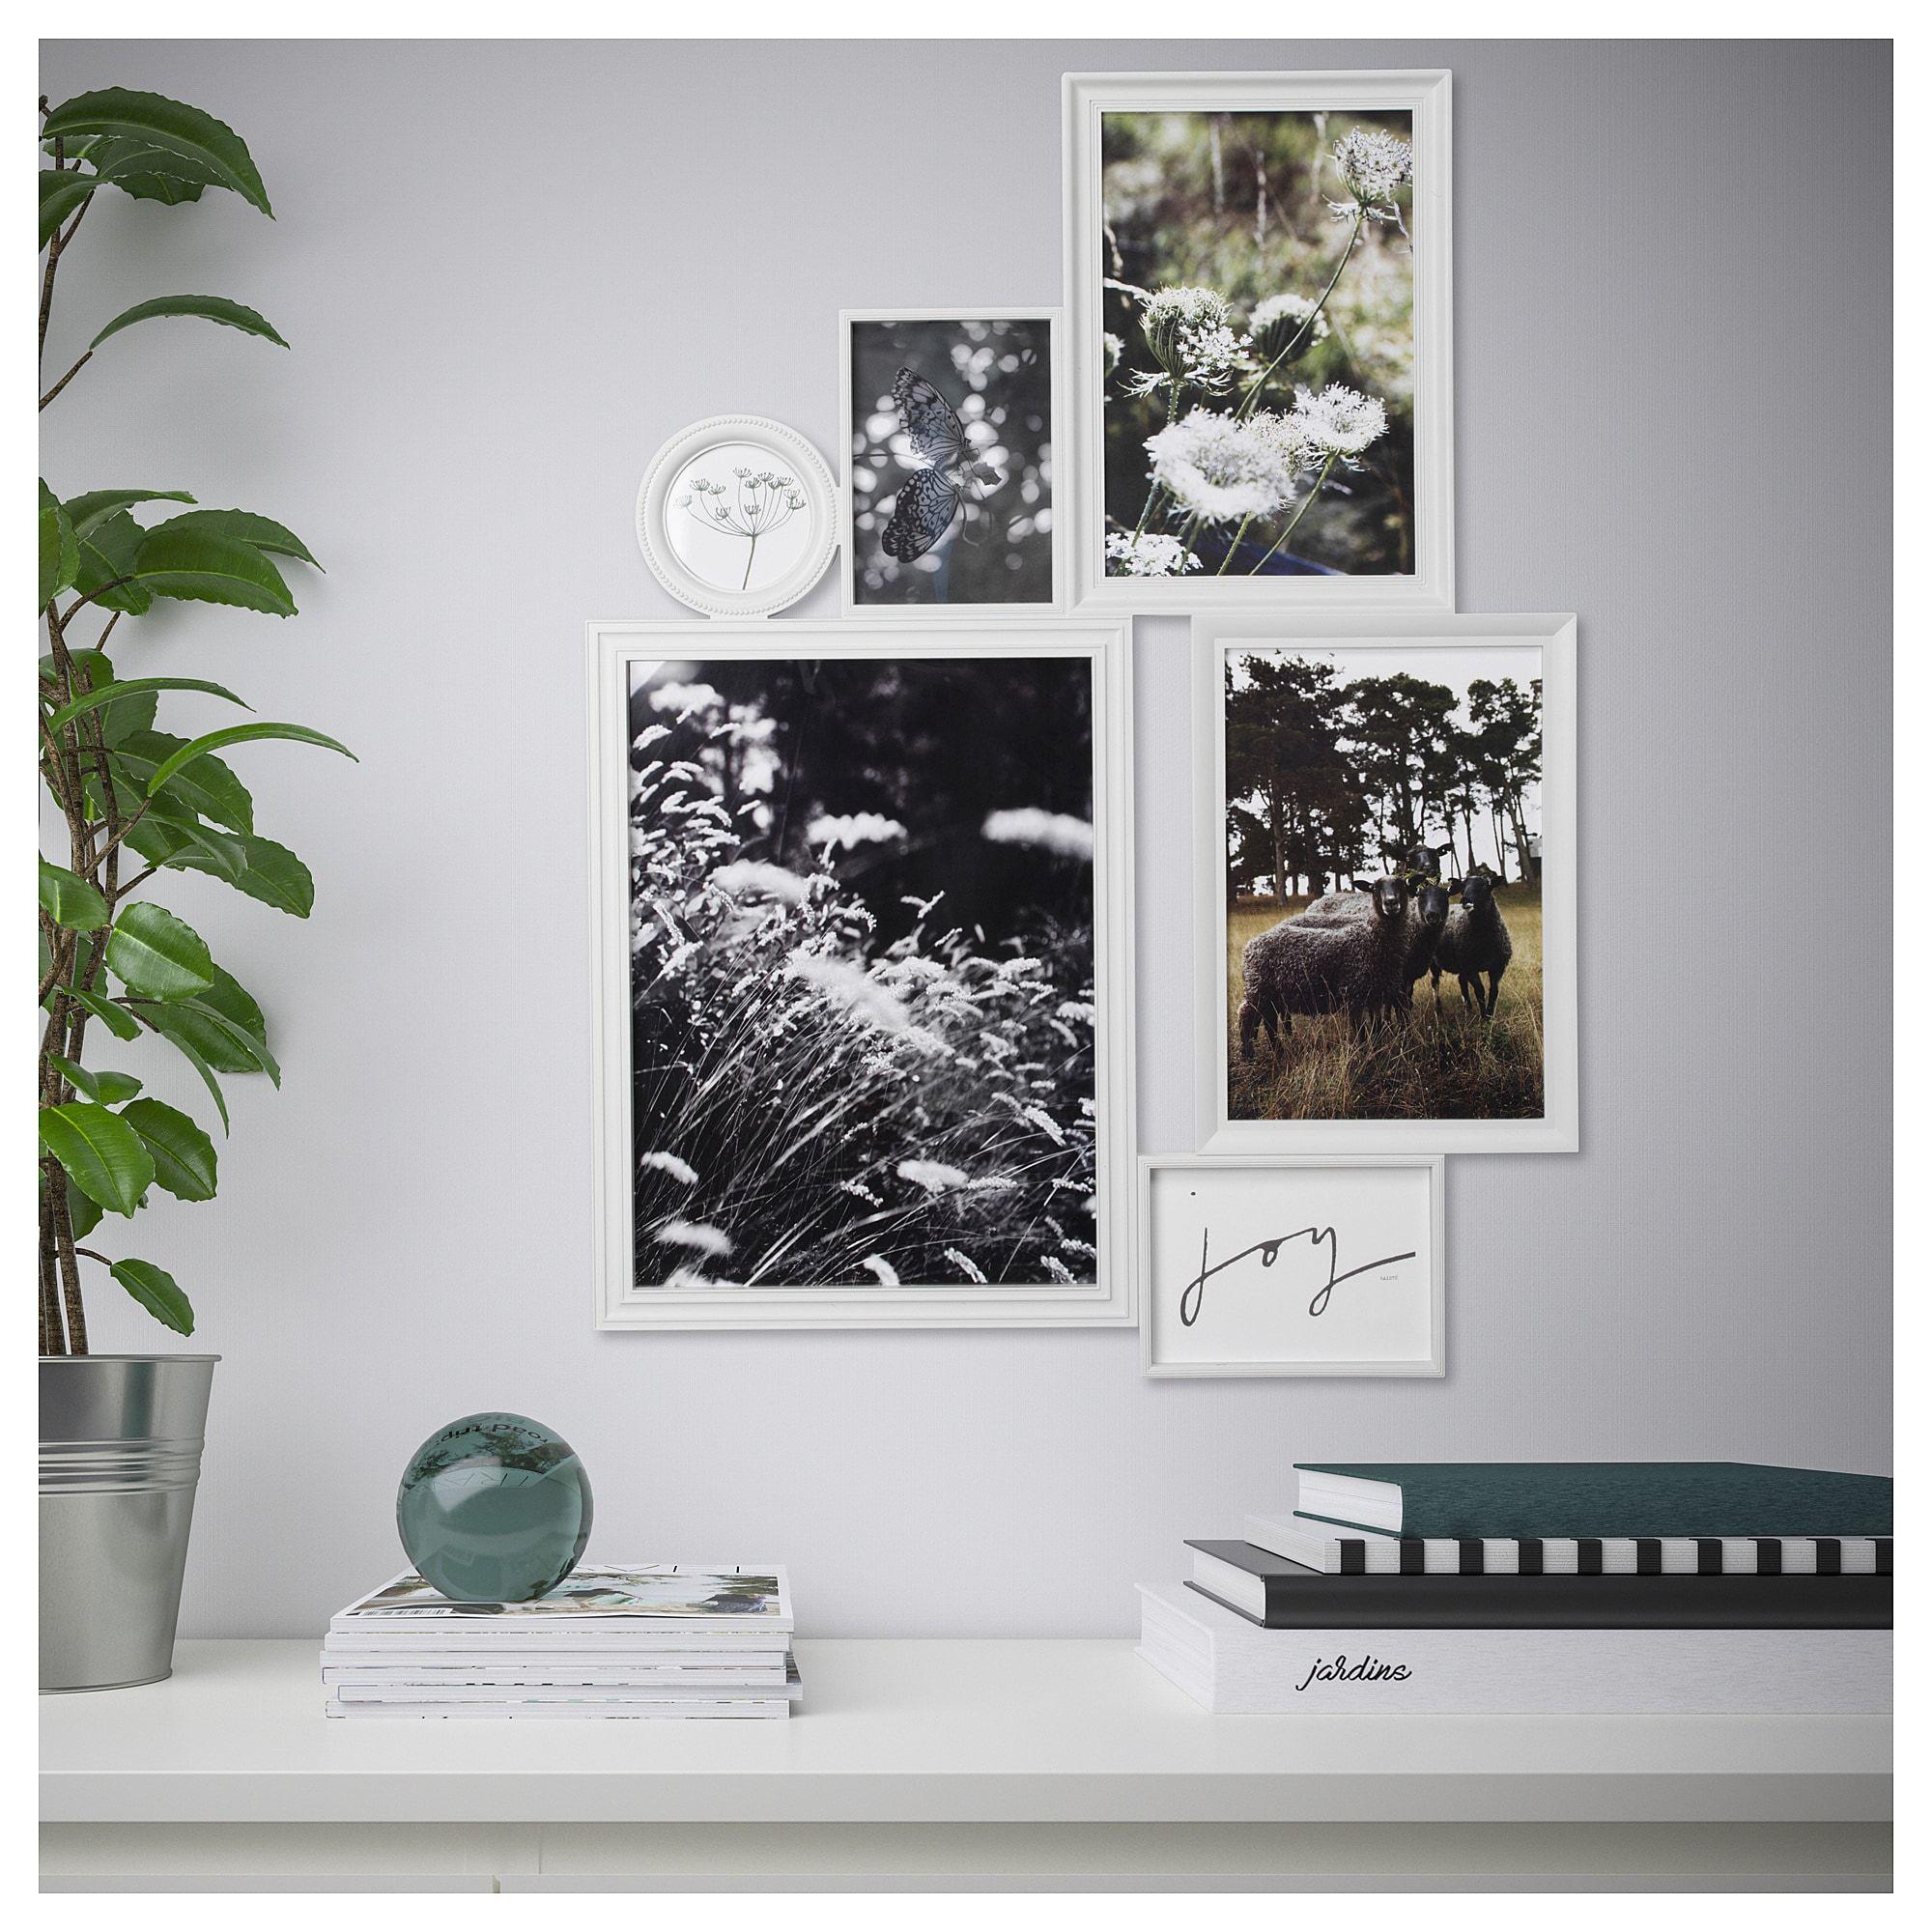 Vitaby Collage Frame For 6 Photos White Ikea Collage Frames Frame Wall Collage Ikea Picture Frame